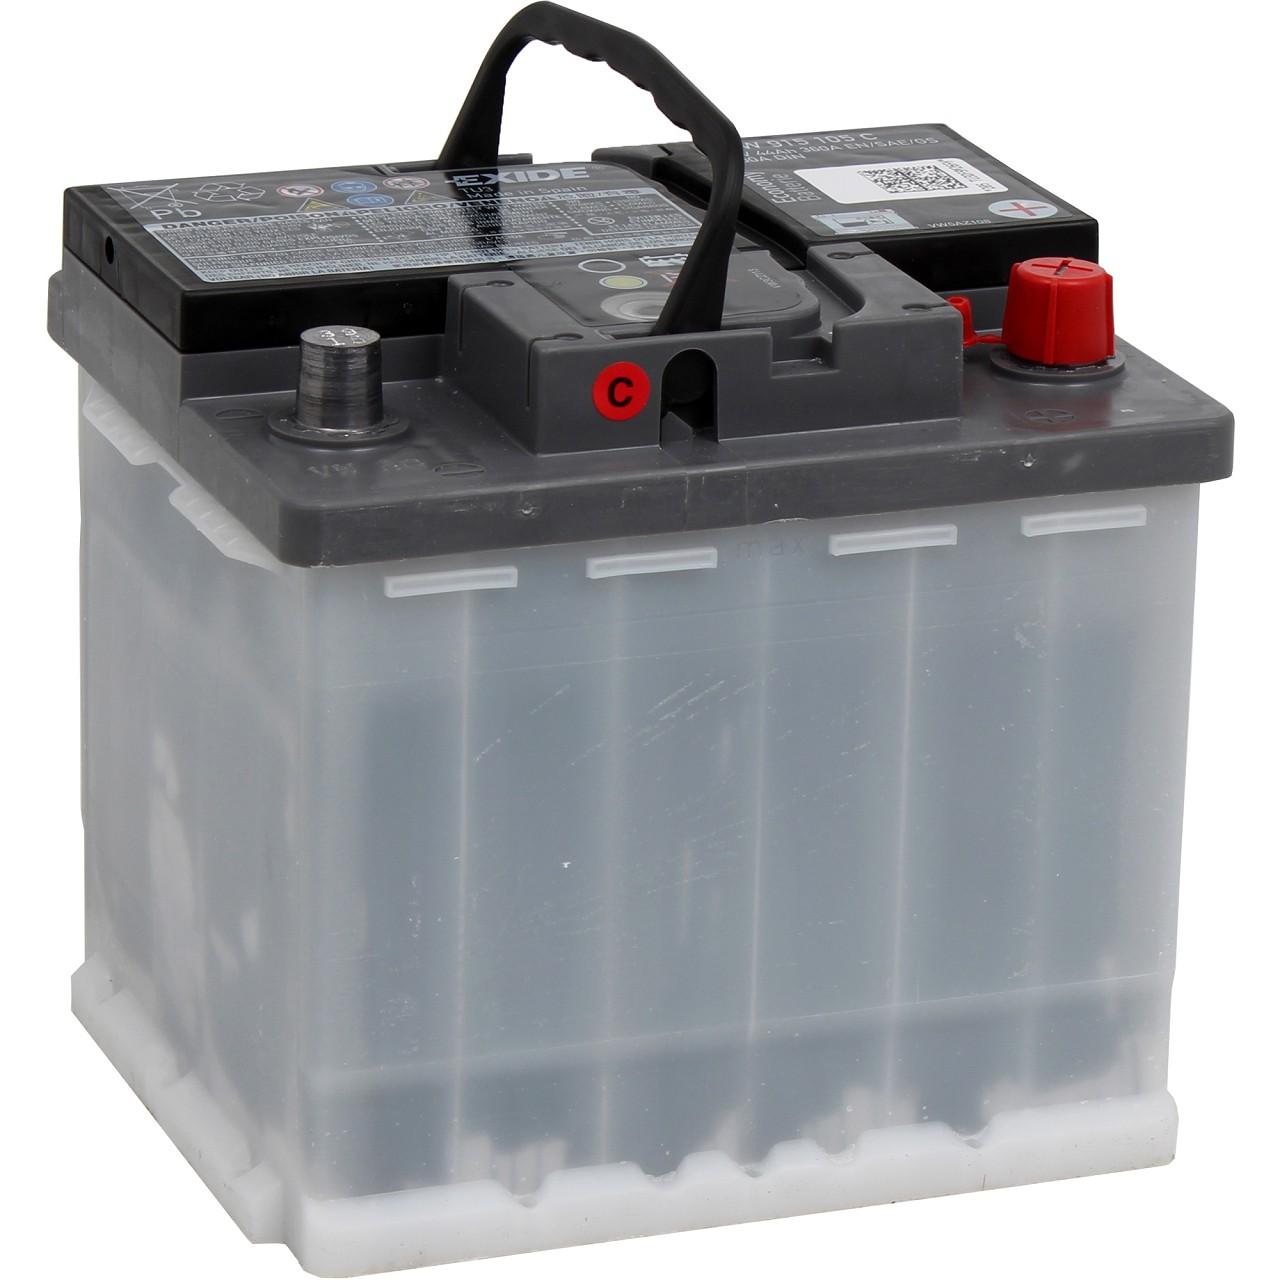 ORIGINAL VW Autobatterie Batterie Starterbatterie 12V 44Ah 220/360A JZW915105C